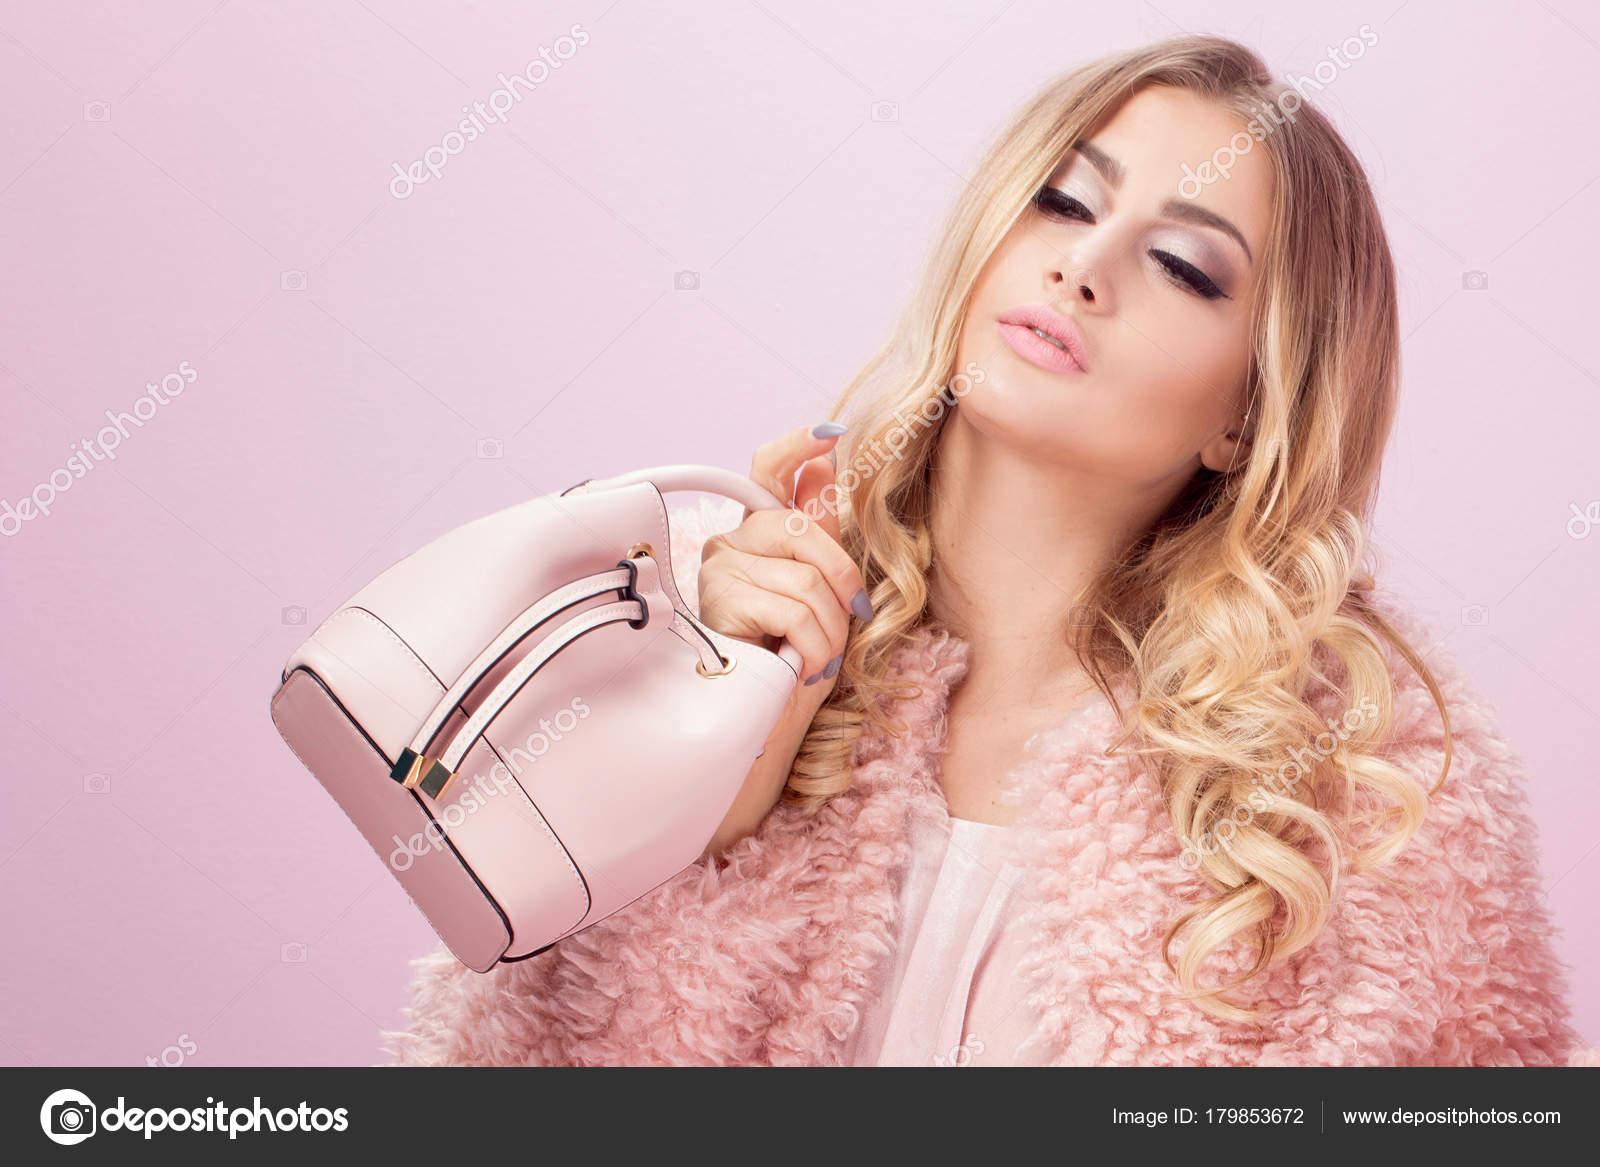 fotosessiya-blondinka-visokaya